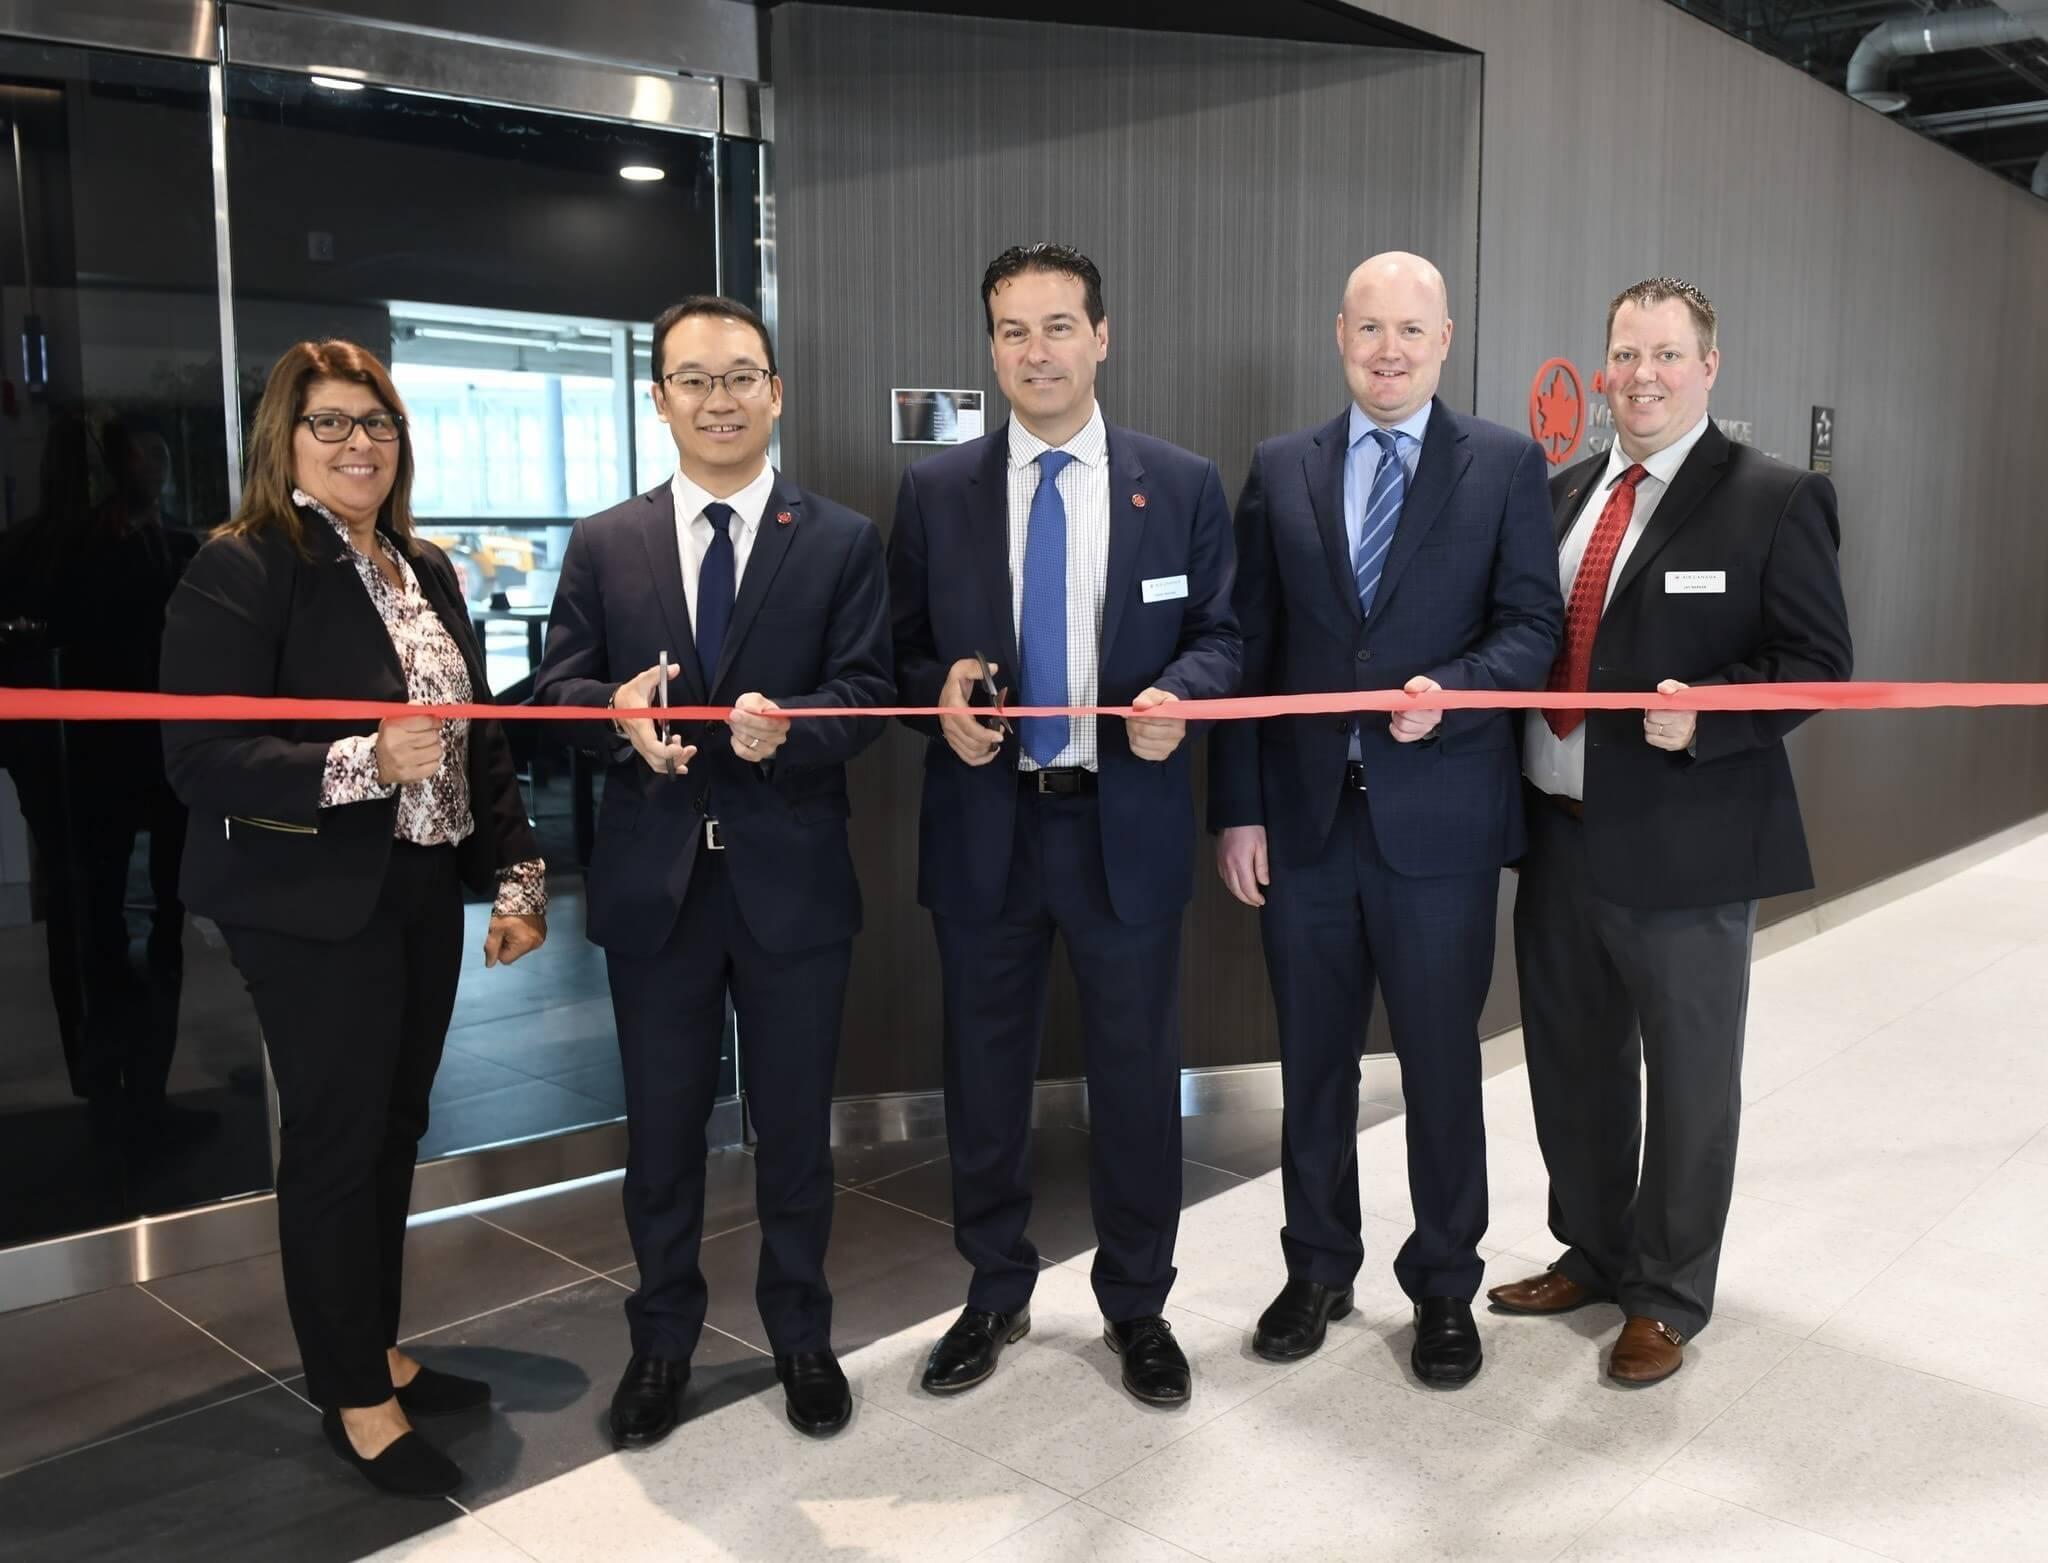 , Air Canada unveils Maple Leaf Lounge Express at Toronto Pearson International Airport, Buzz travel | eTurboNews |Travel News